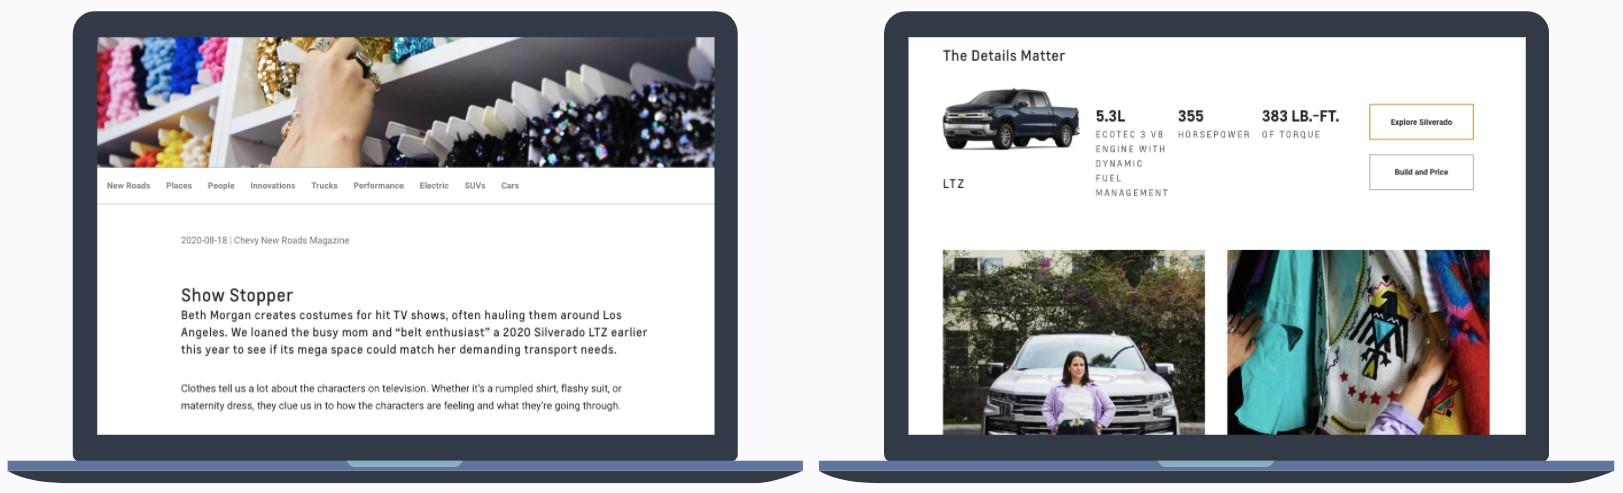 Chevrolet's Blog Content